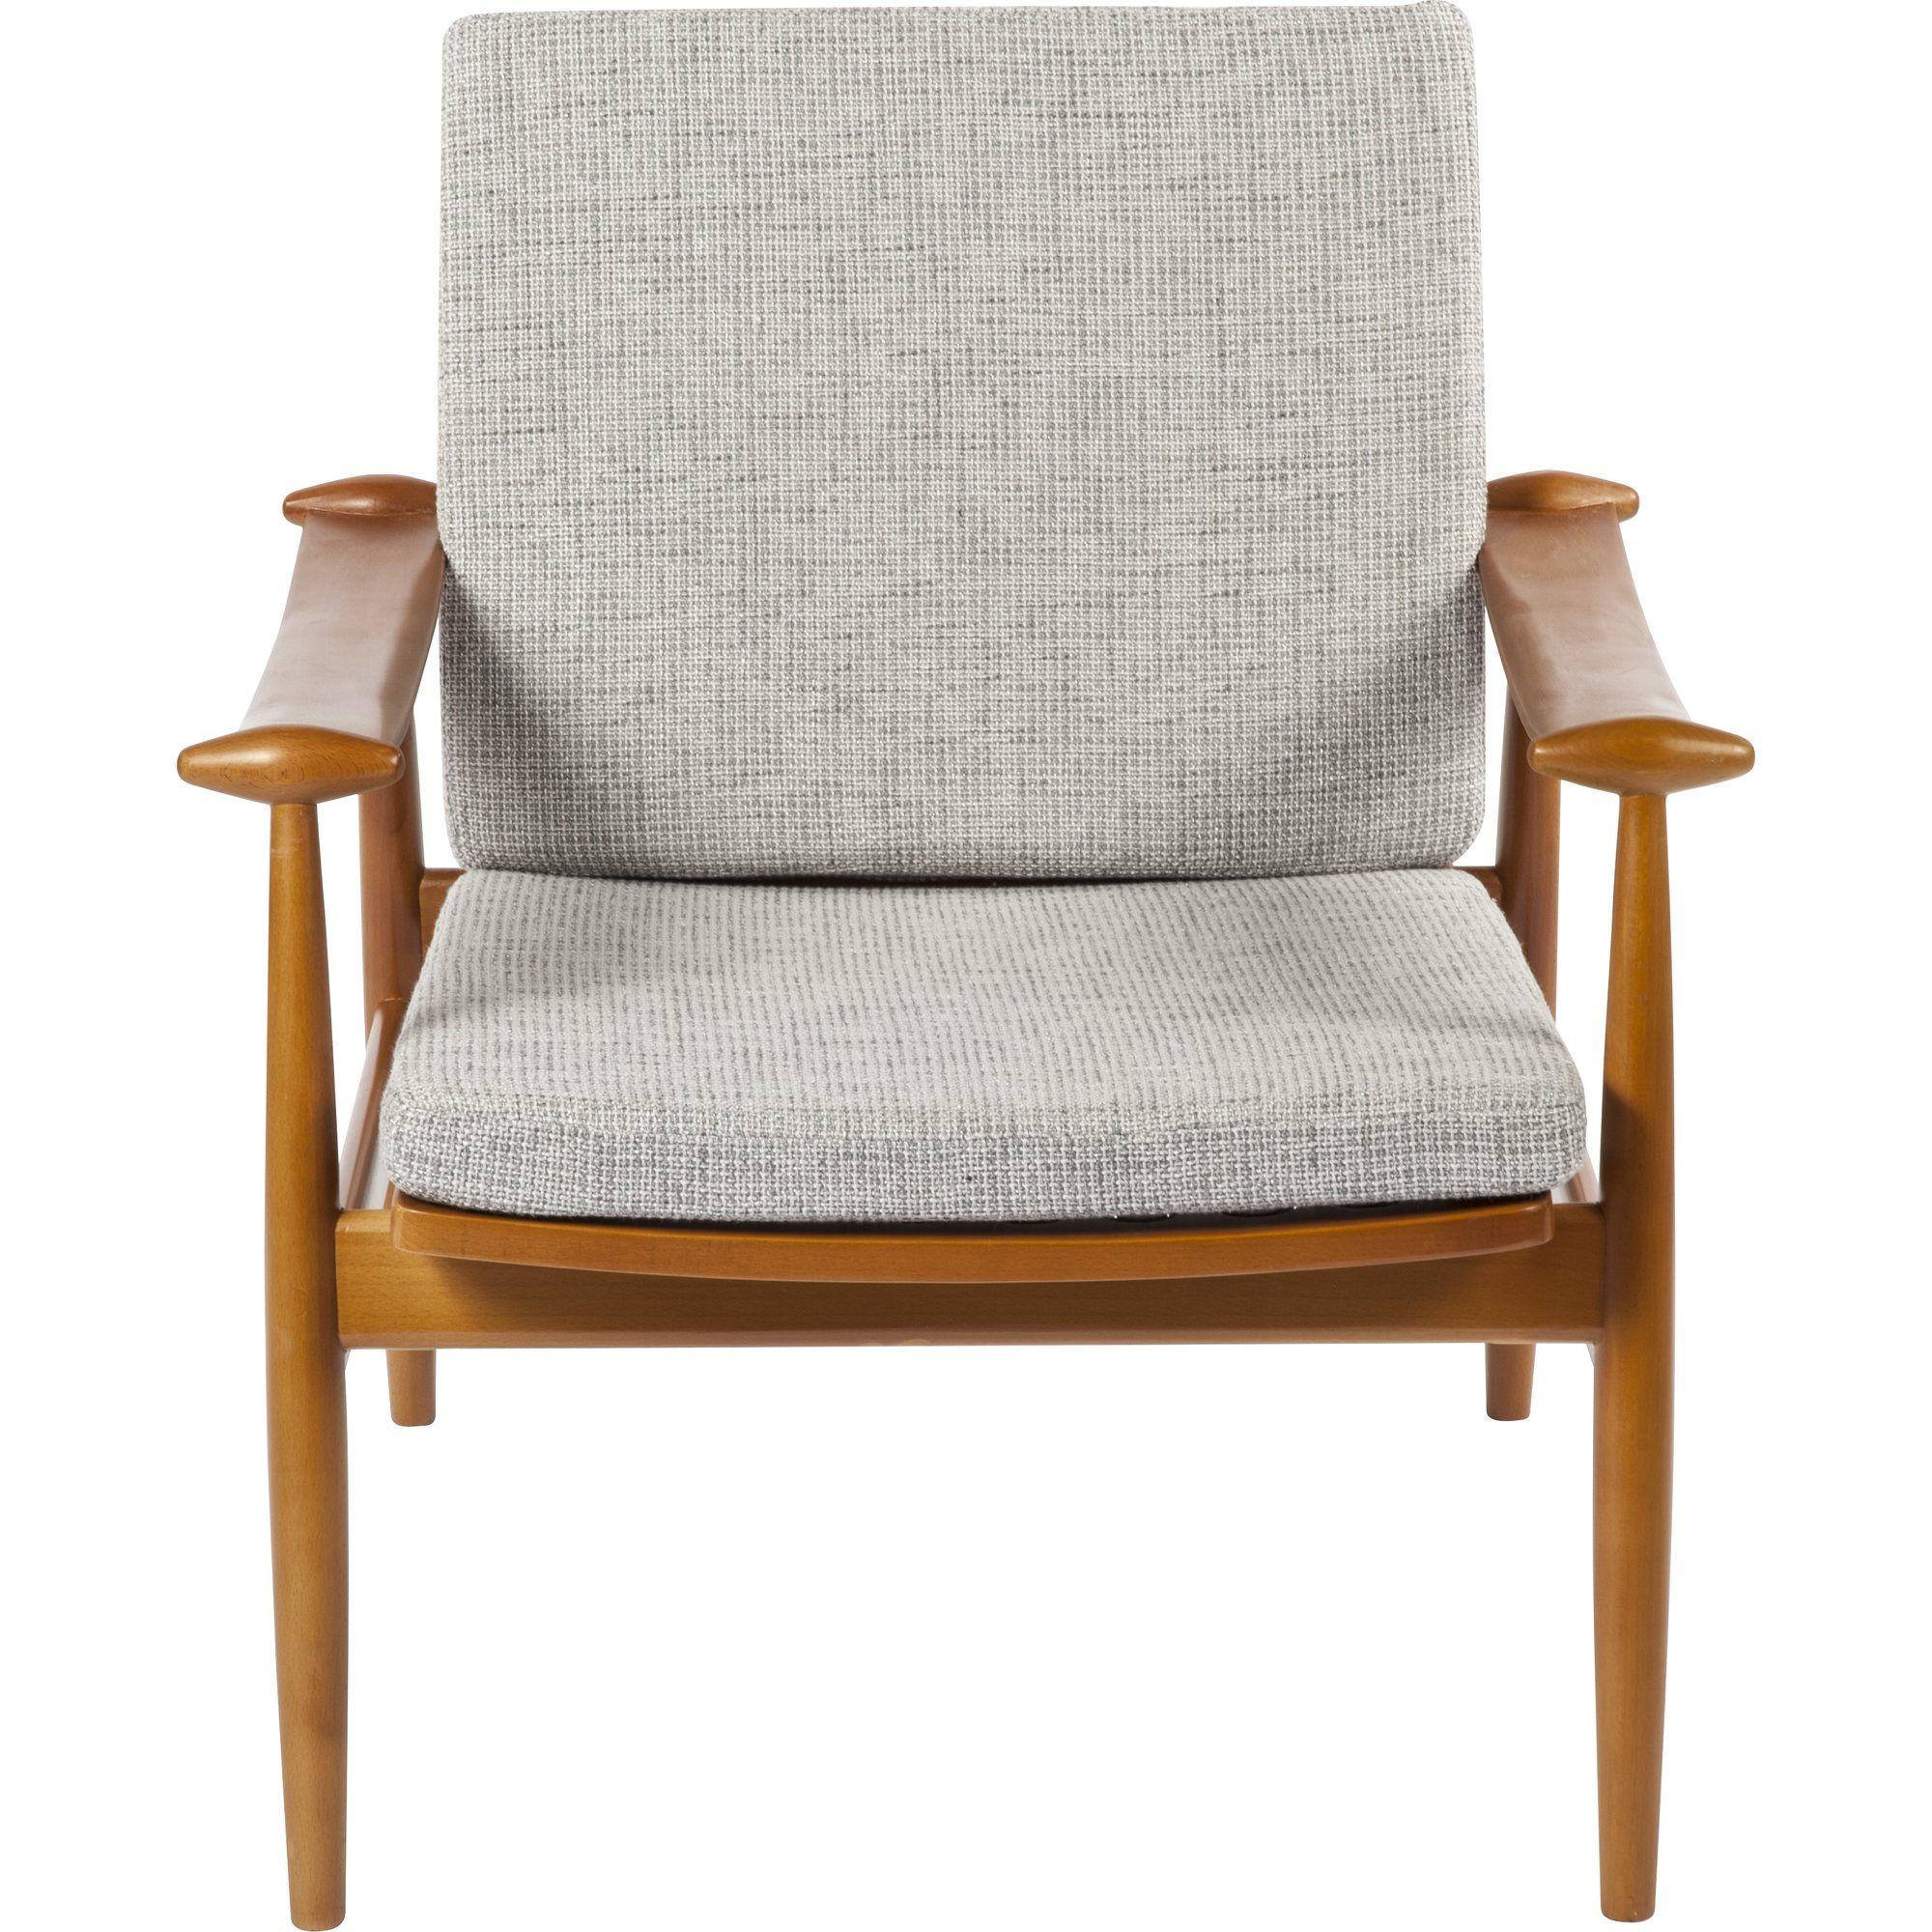 Awesome Dcor Design Furnituredecor Pinterest Perm Accent Furniture